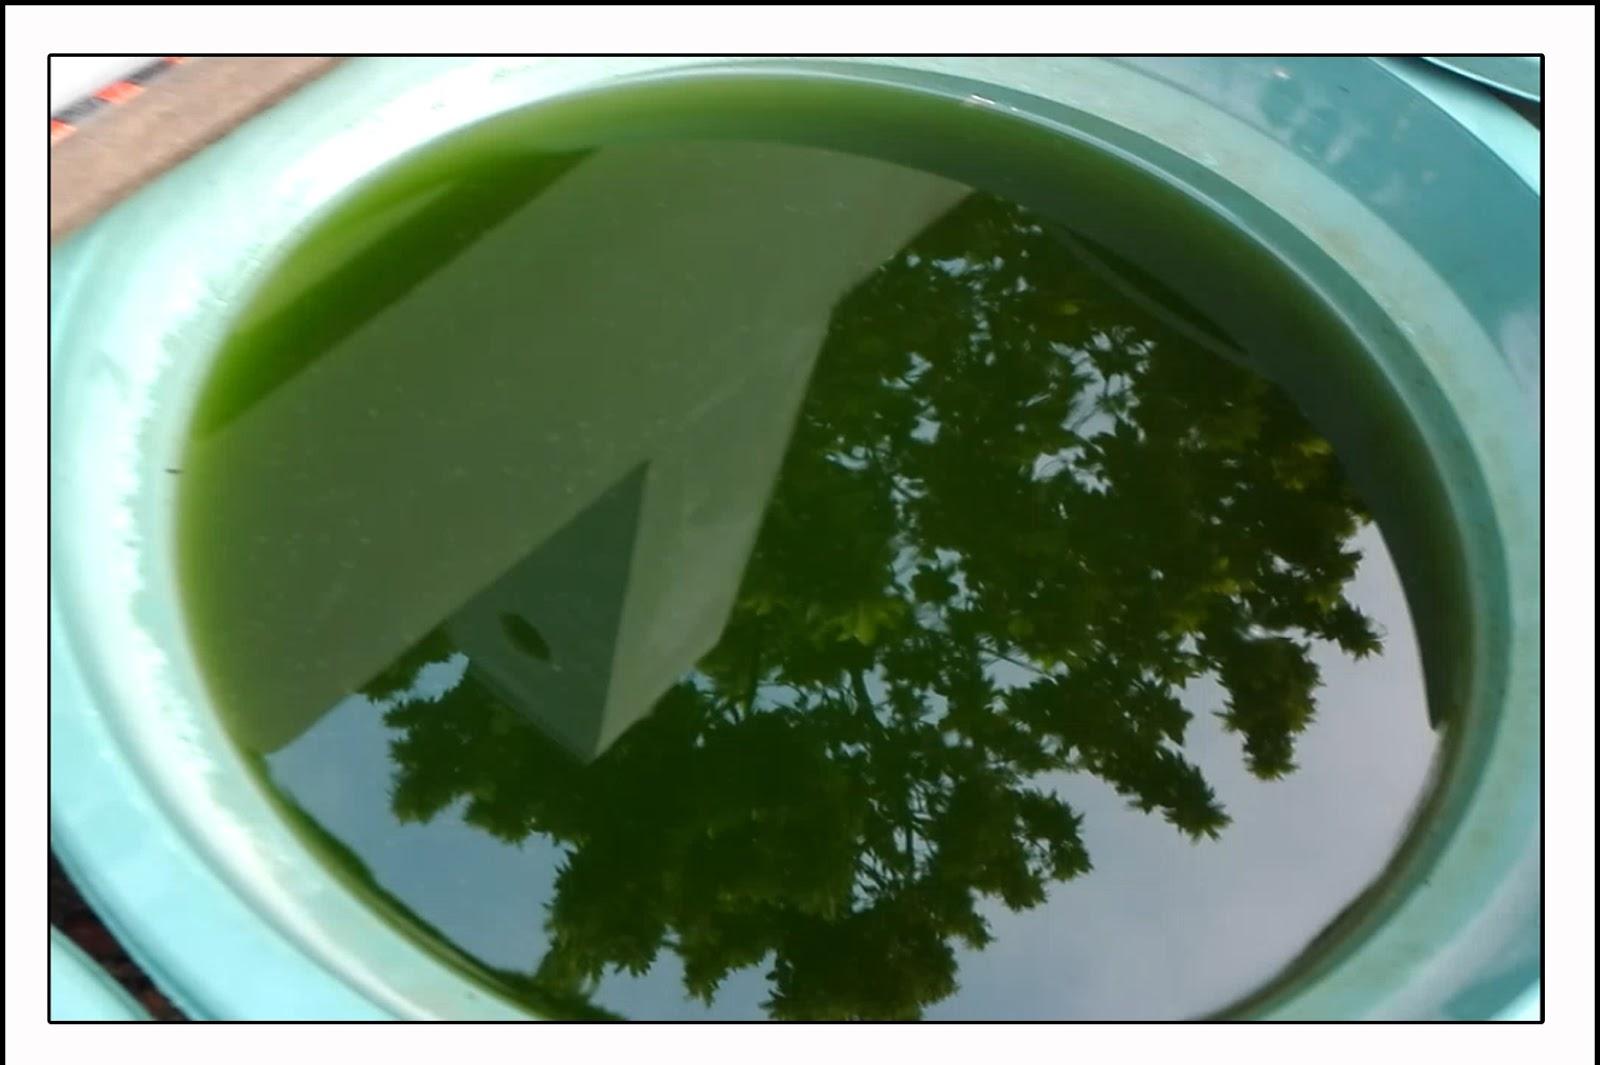 cara mudah budidaya kutu air dgn green